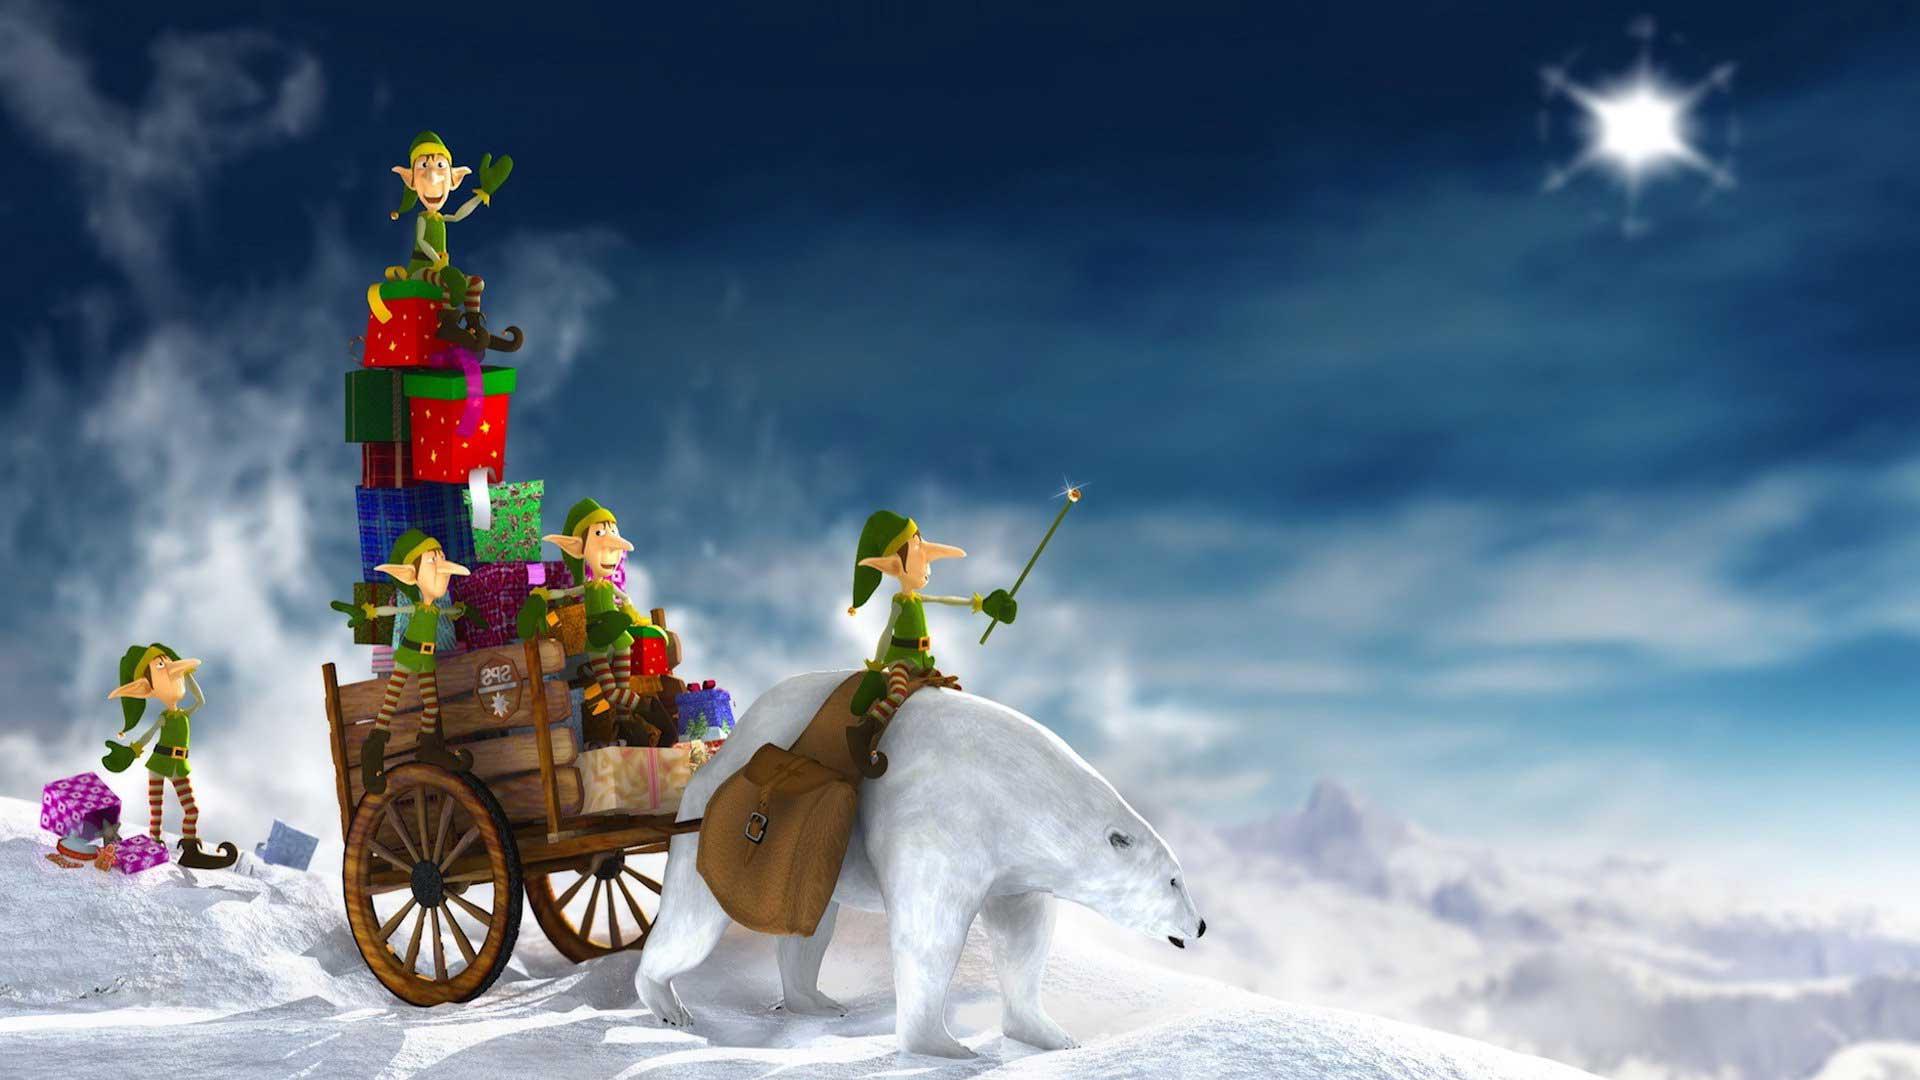 Christmas Background Picsart.Christmas Elf Wallpapers Top Free Christmas Elf